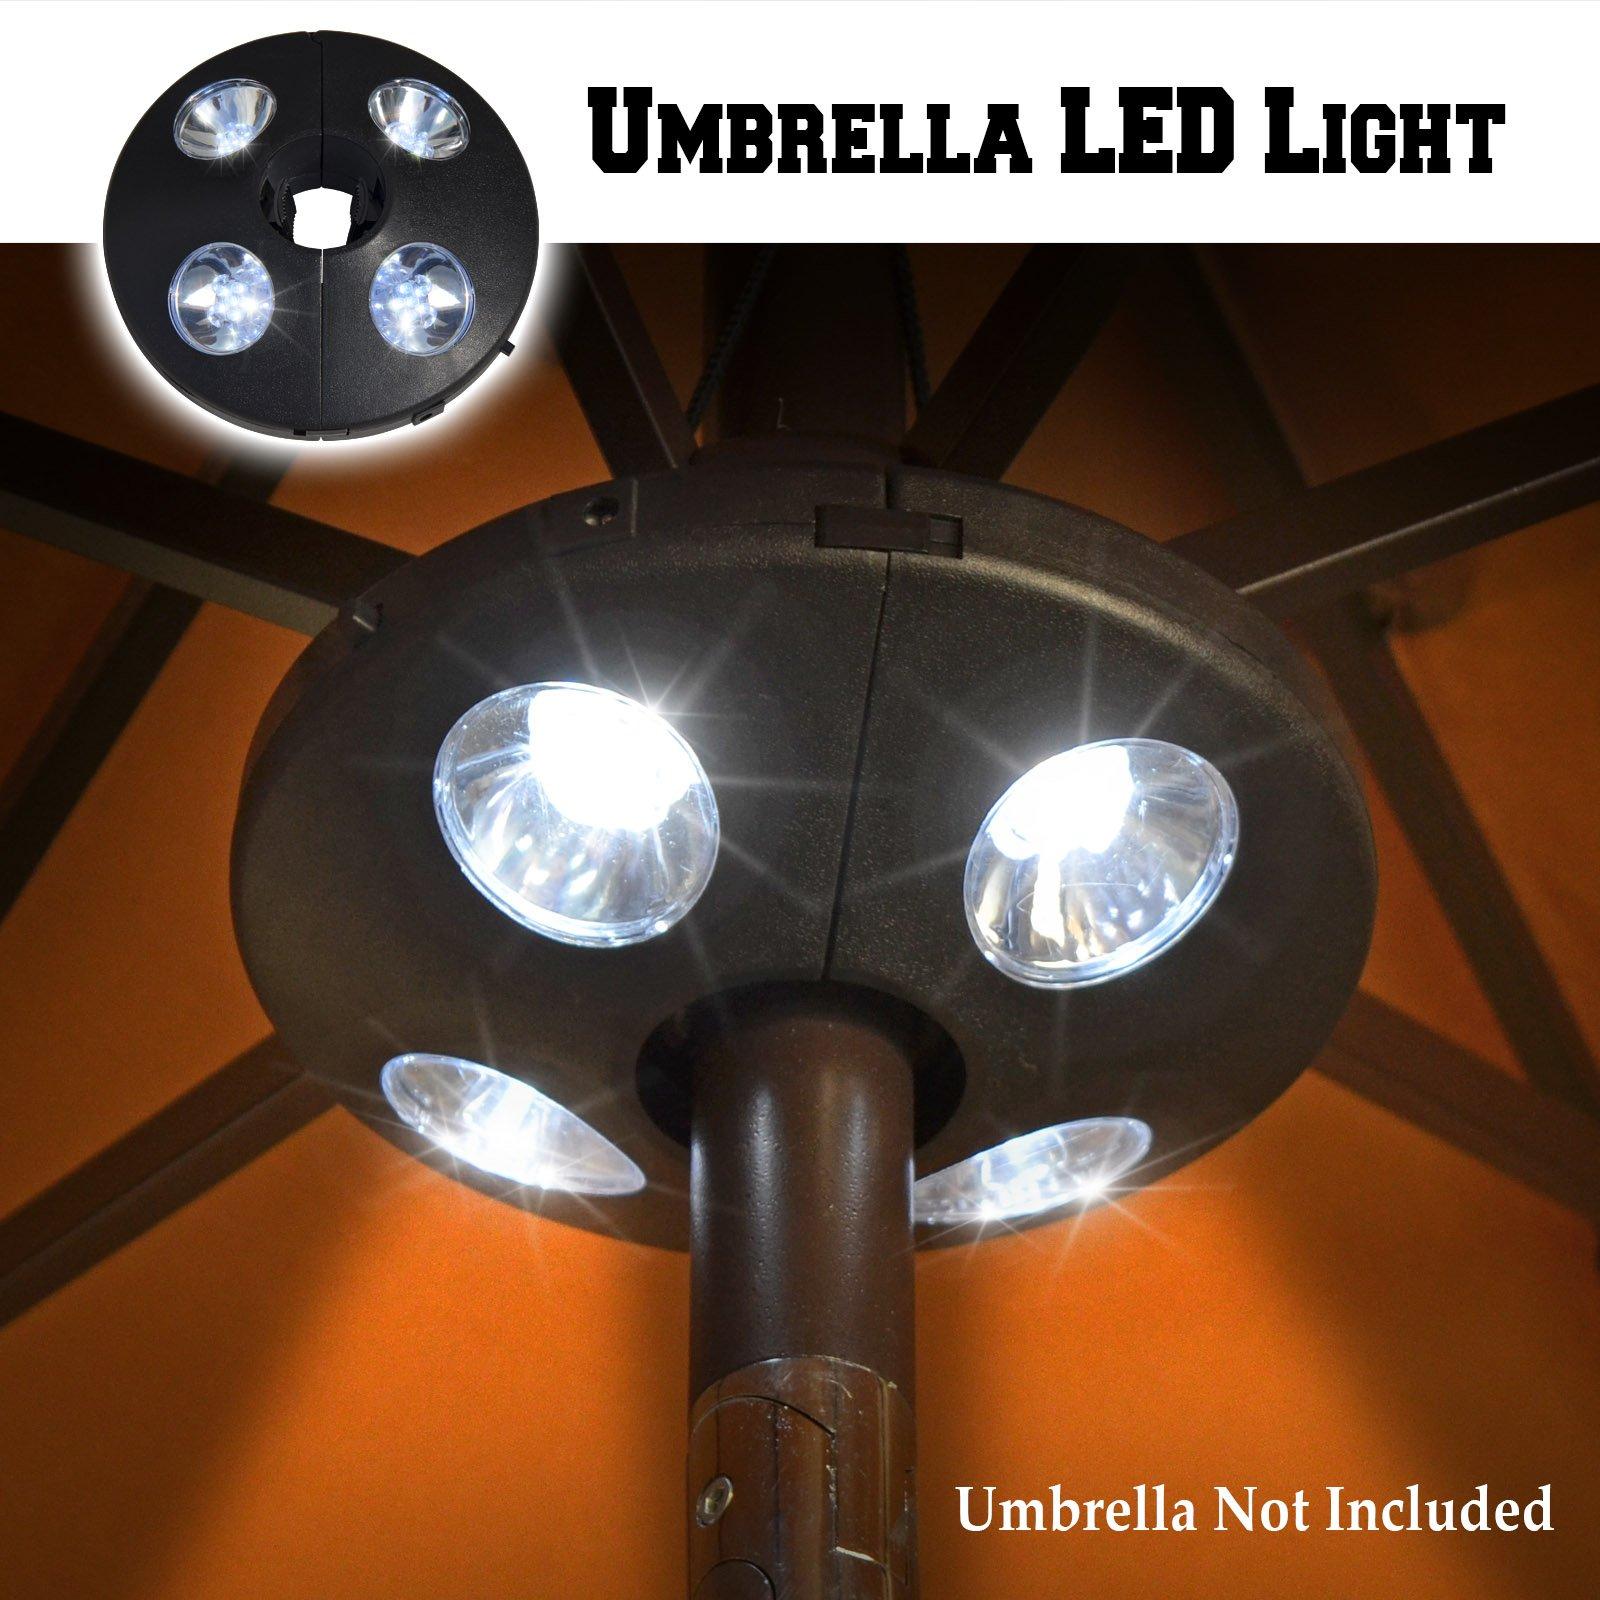 BenefitUSA Patio Umbrella Light 24 LED Wireless Night Lights Battery Operated Umbrella Pole Light